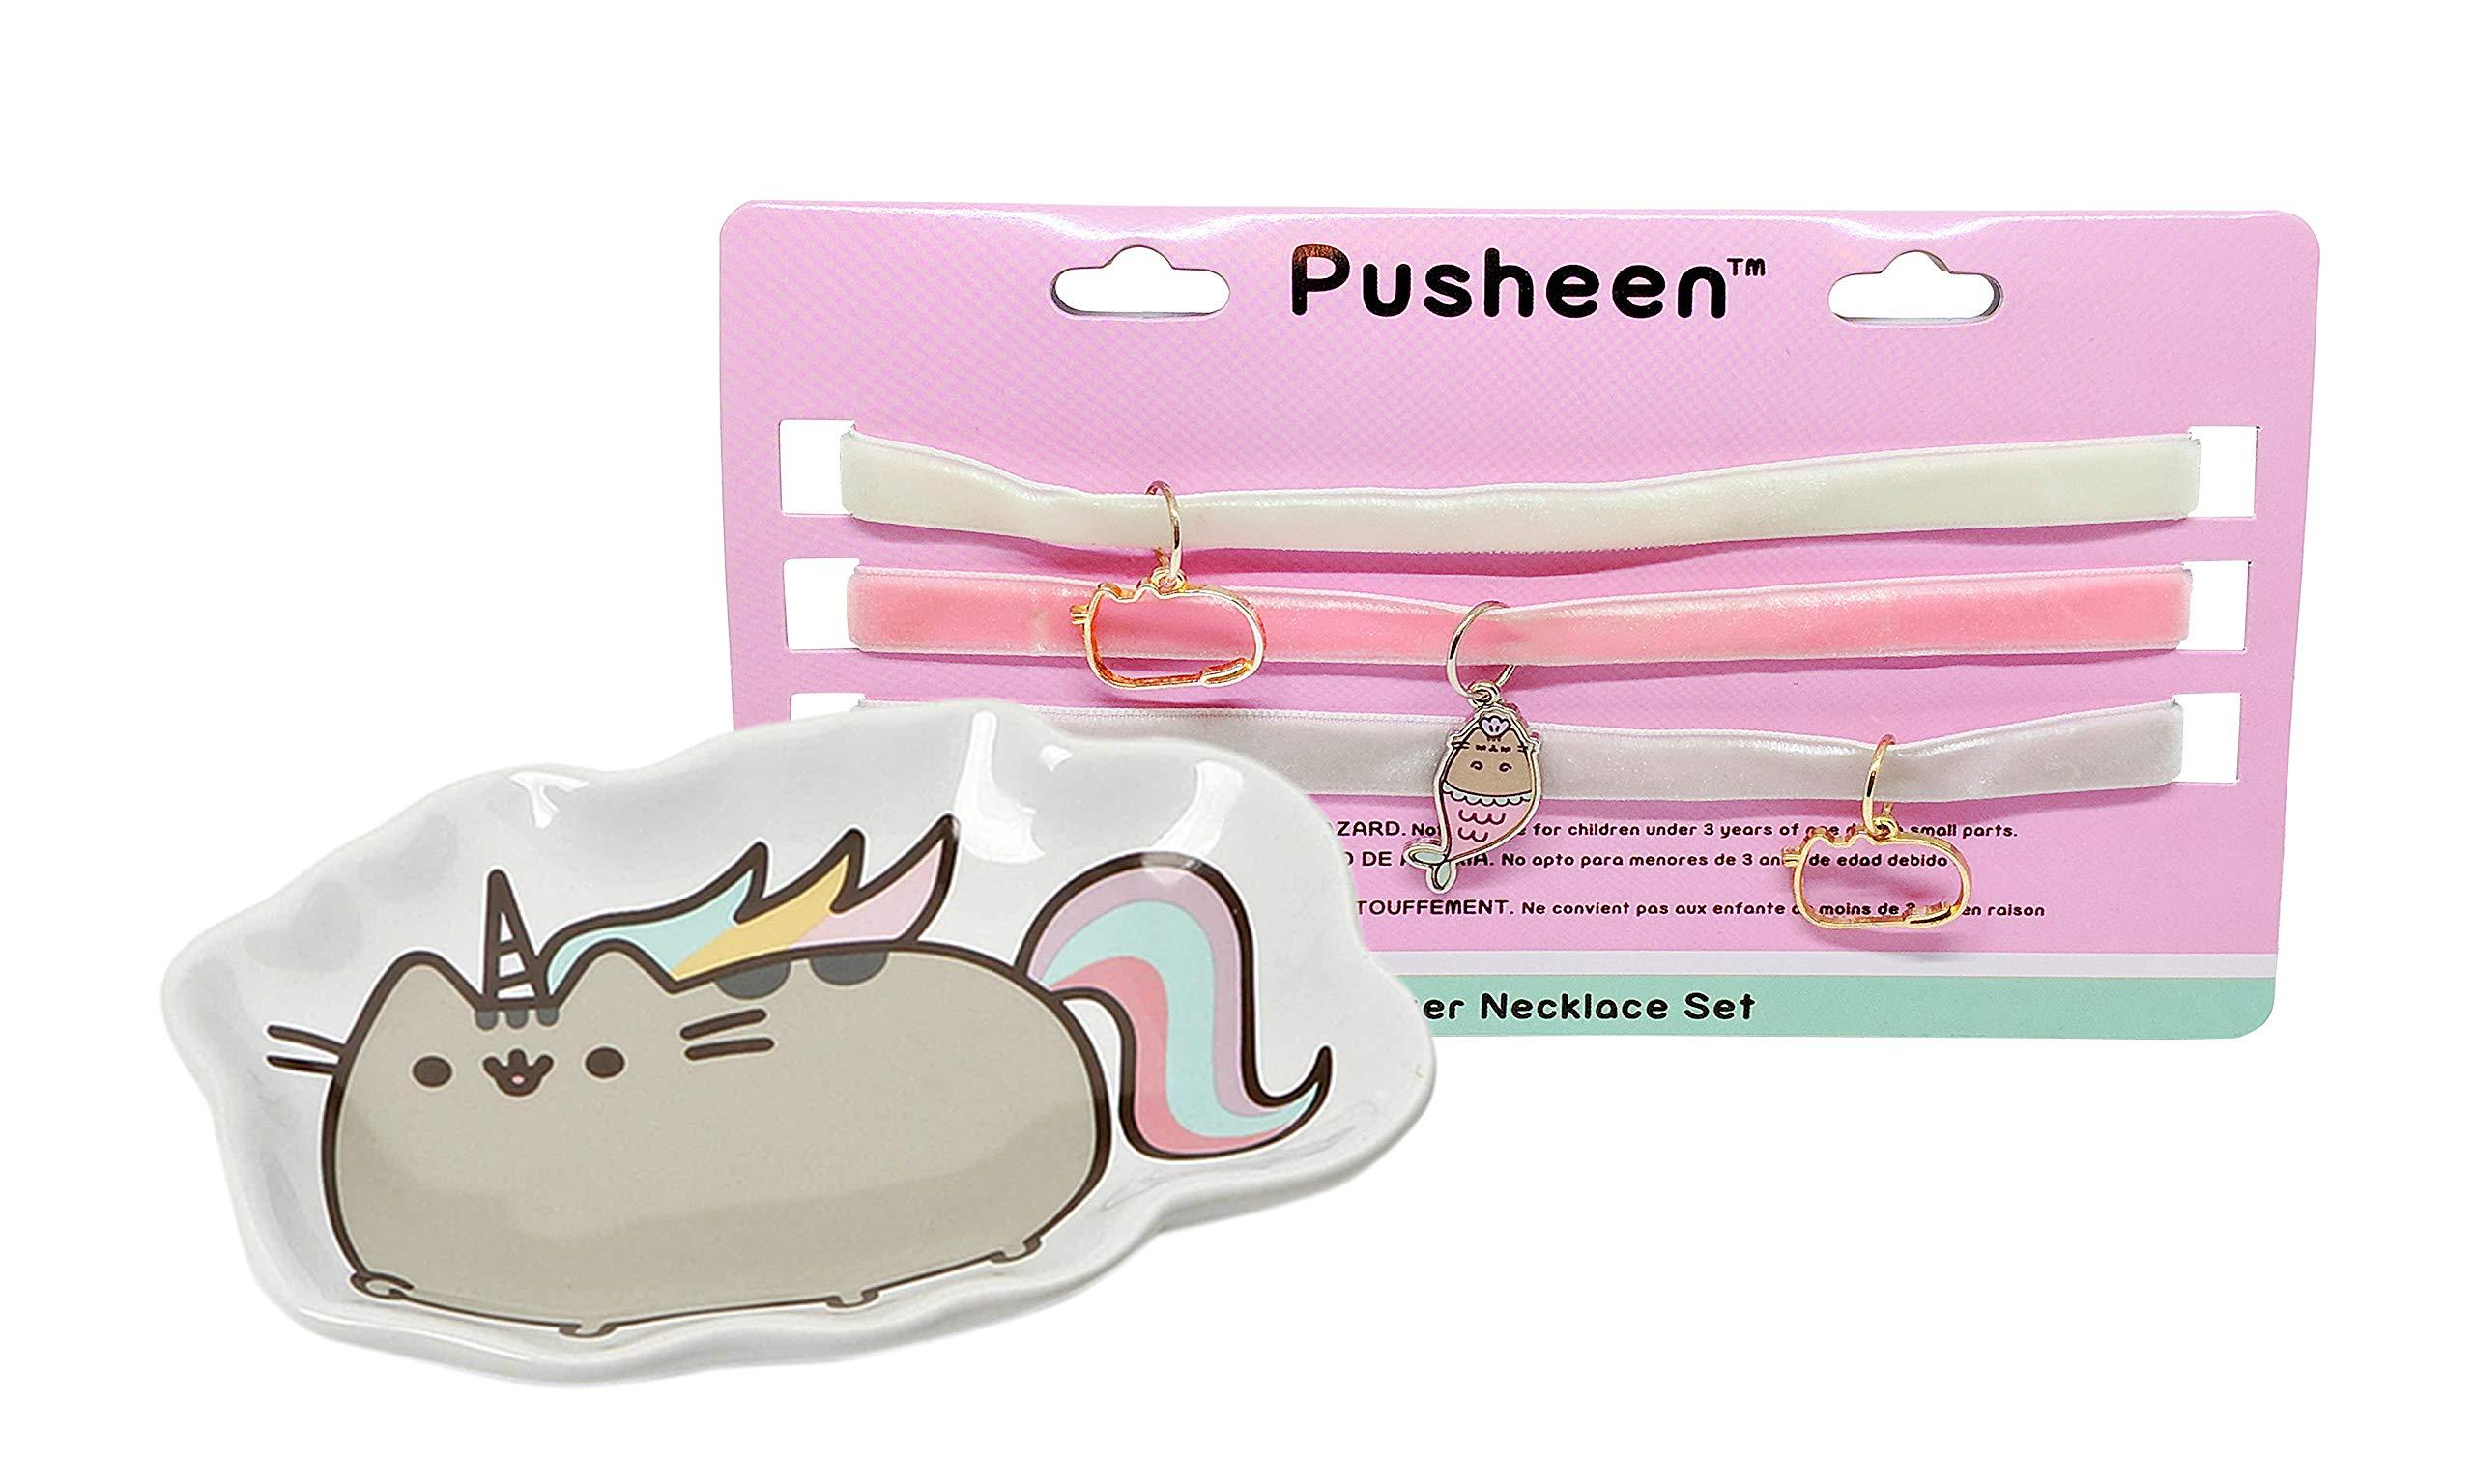 Pusheen Unicorn Tray Velvet Charm Choker Necklace Set